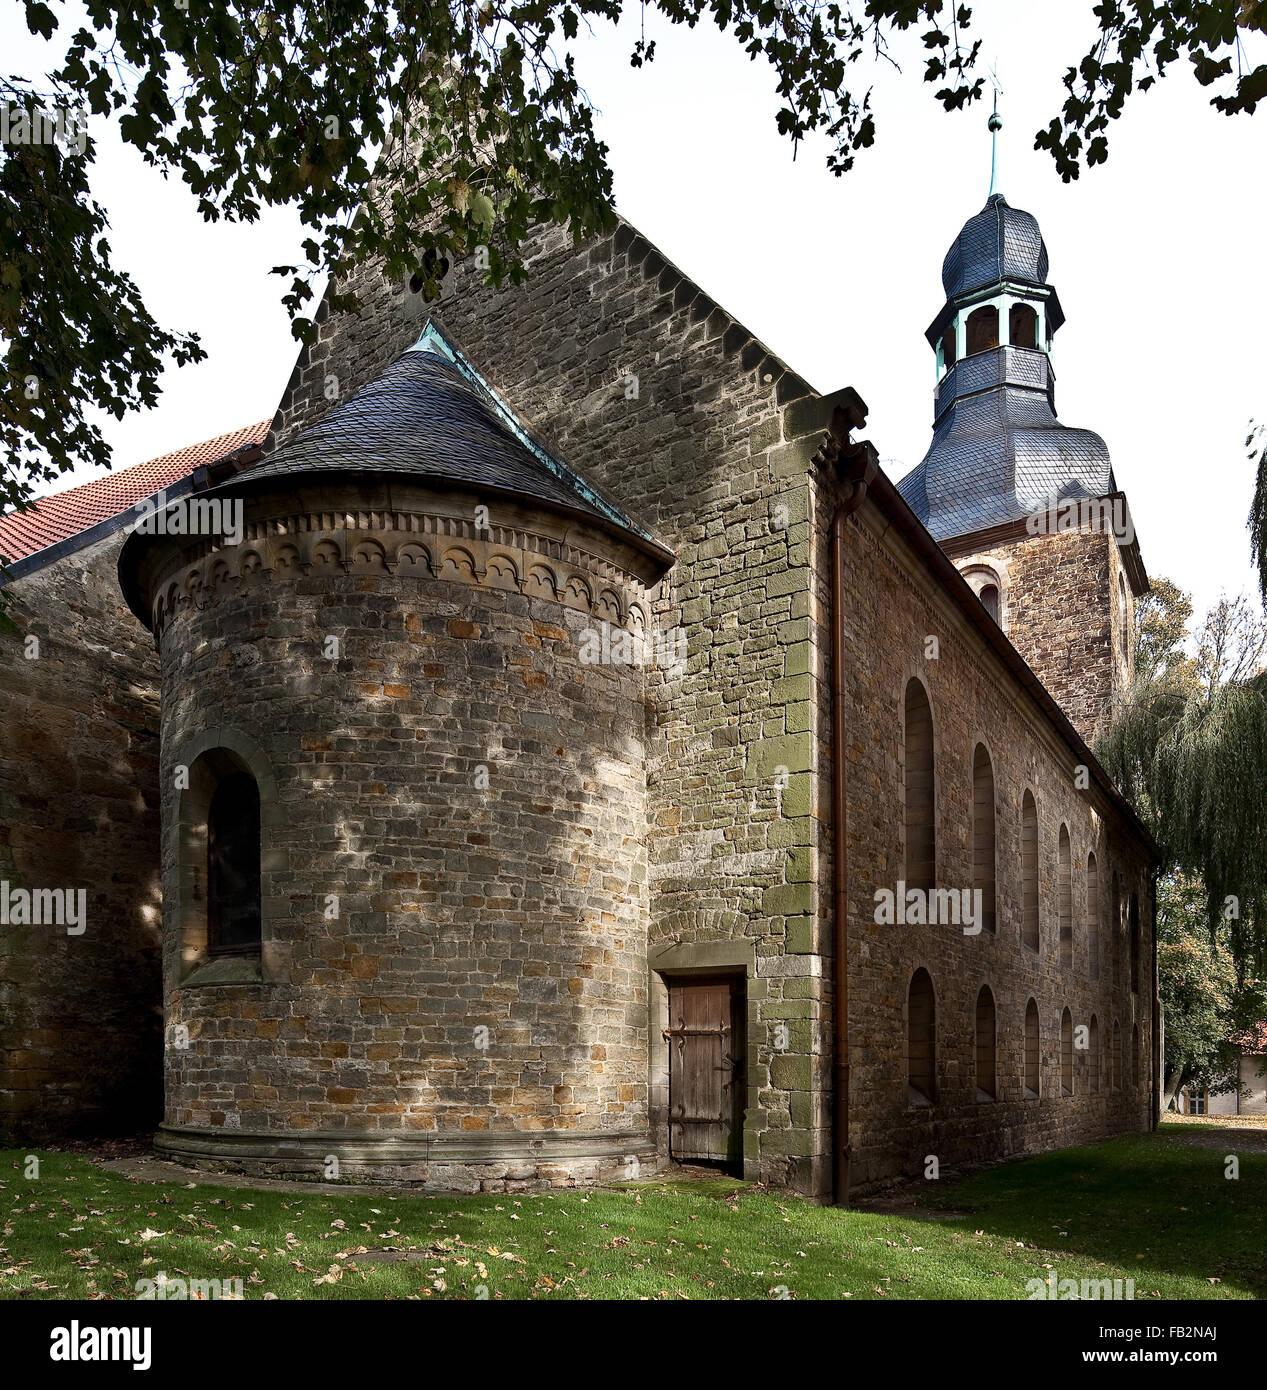 Marienborn bei Helmstedt, ehemaliges Kloster - Stock Image